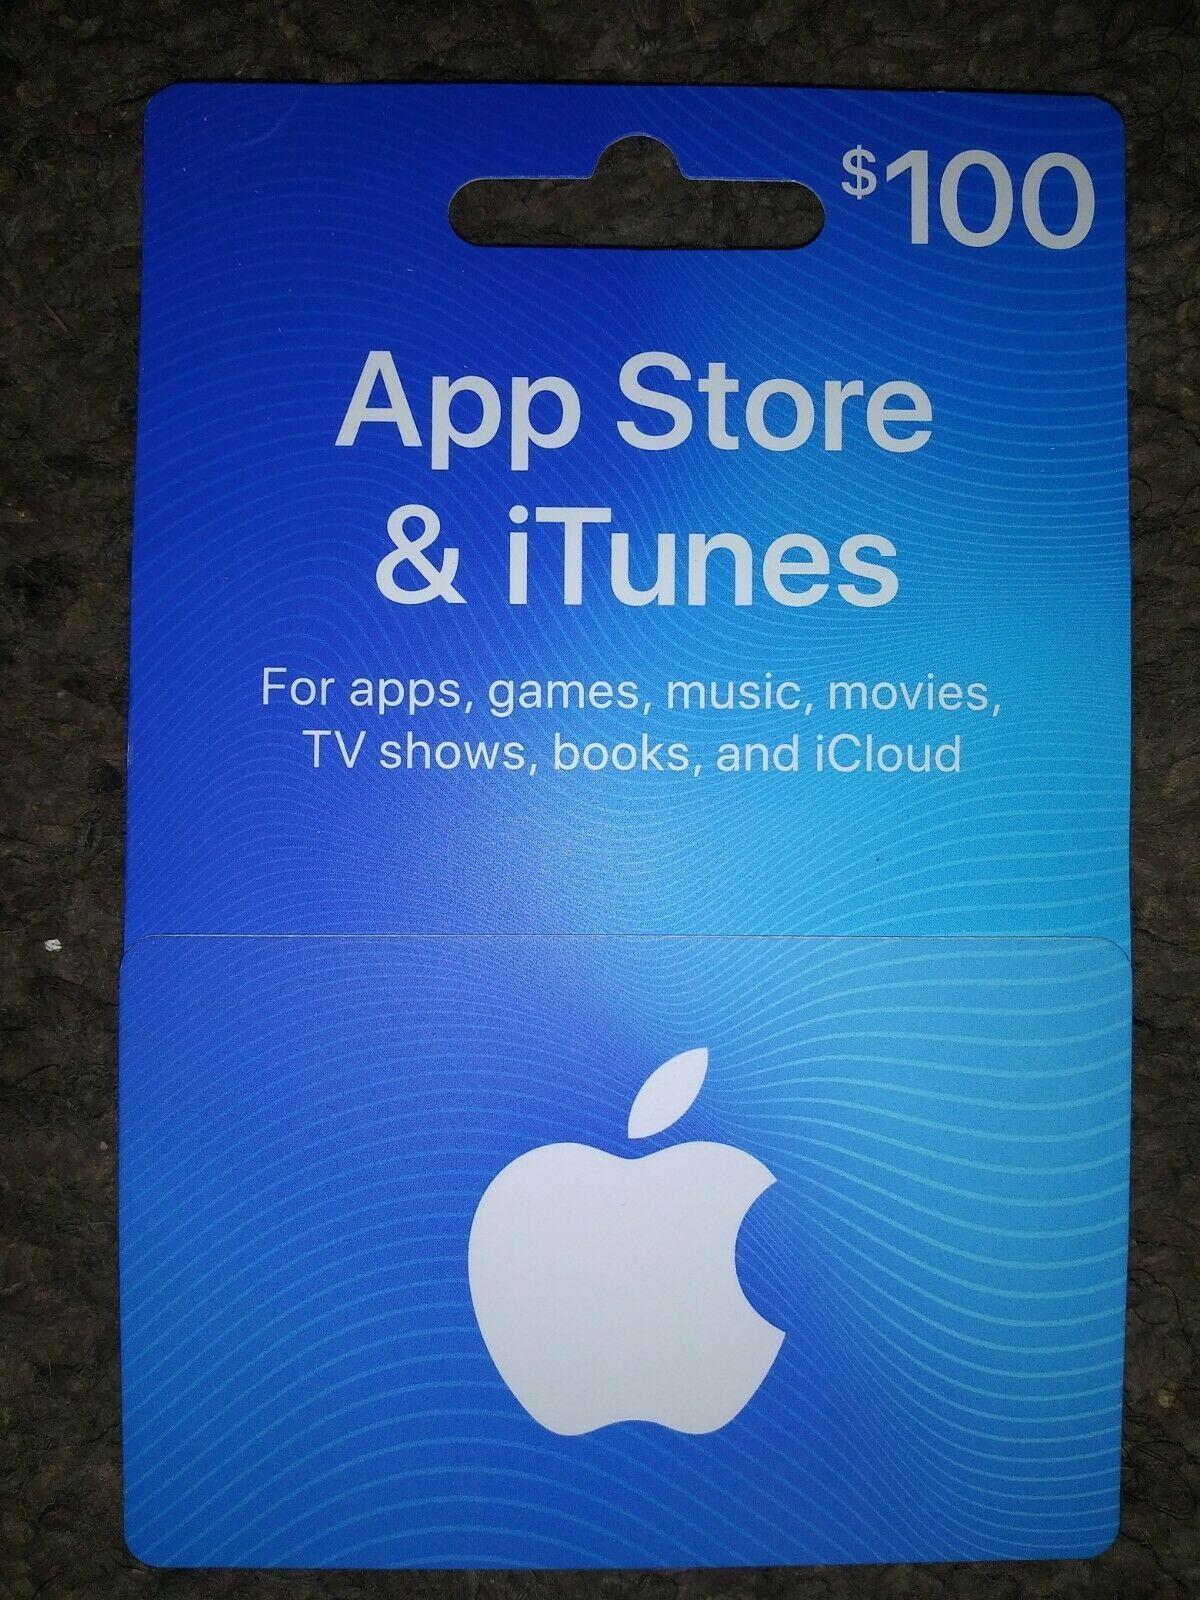 Free Itunes Gift Card Apple Codes Apple 100 App Store Itunes Gift Card Free Itunes Gift Card Itunes Gift Cards Free Gift Card Generator